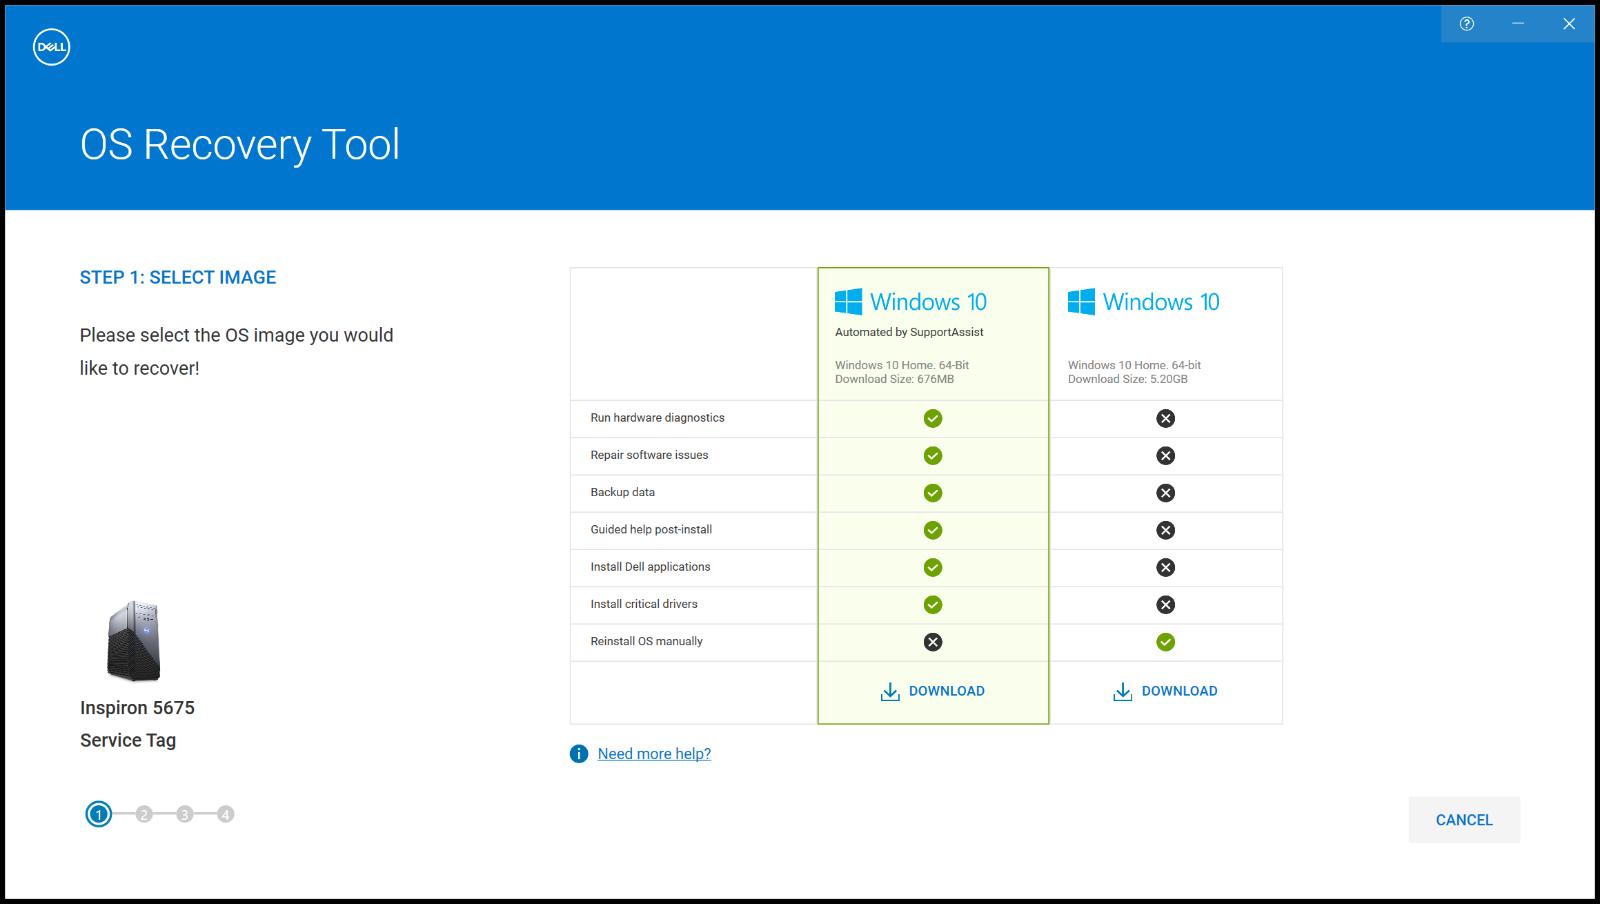 「Windows 10 Automated by SupportAssist」イメージと「Windows 10」イメージの違い(英語の画像)